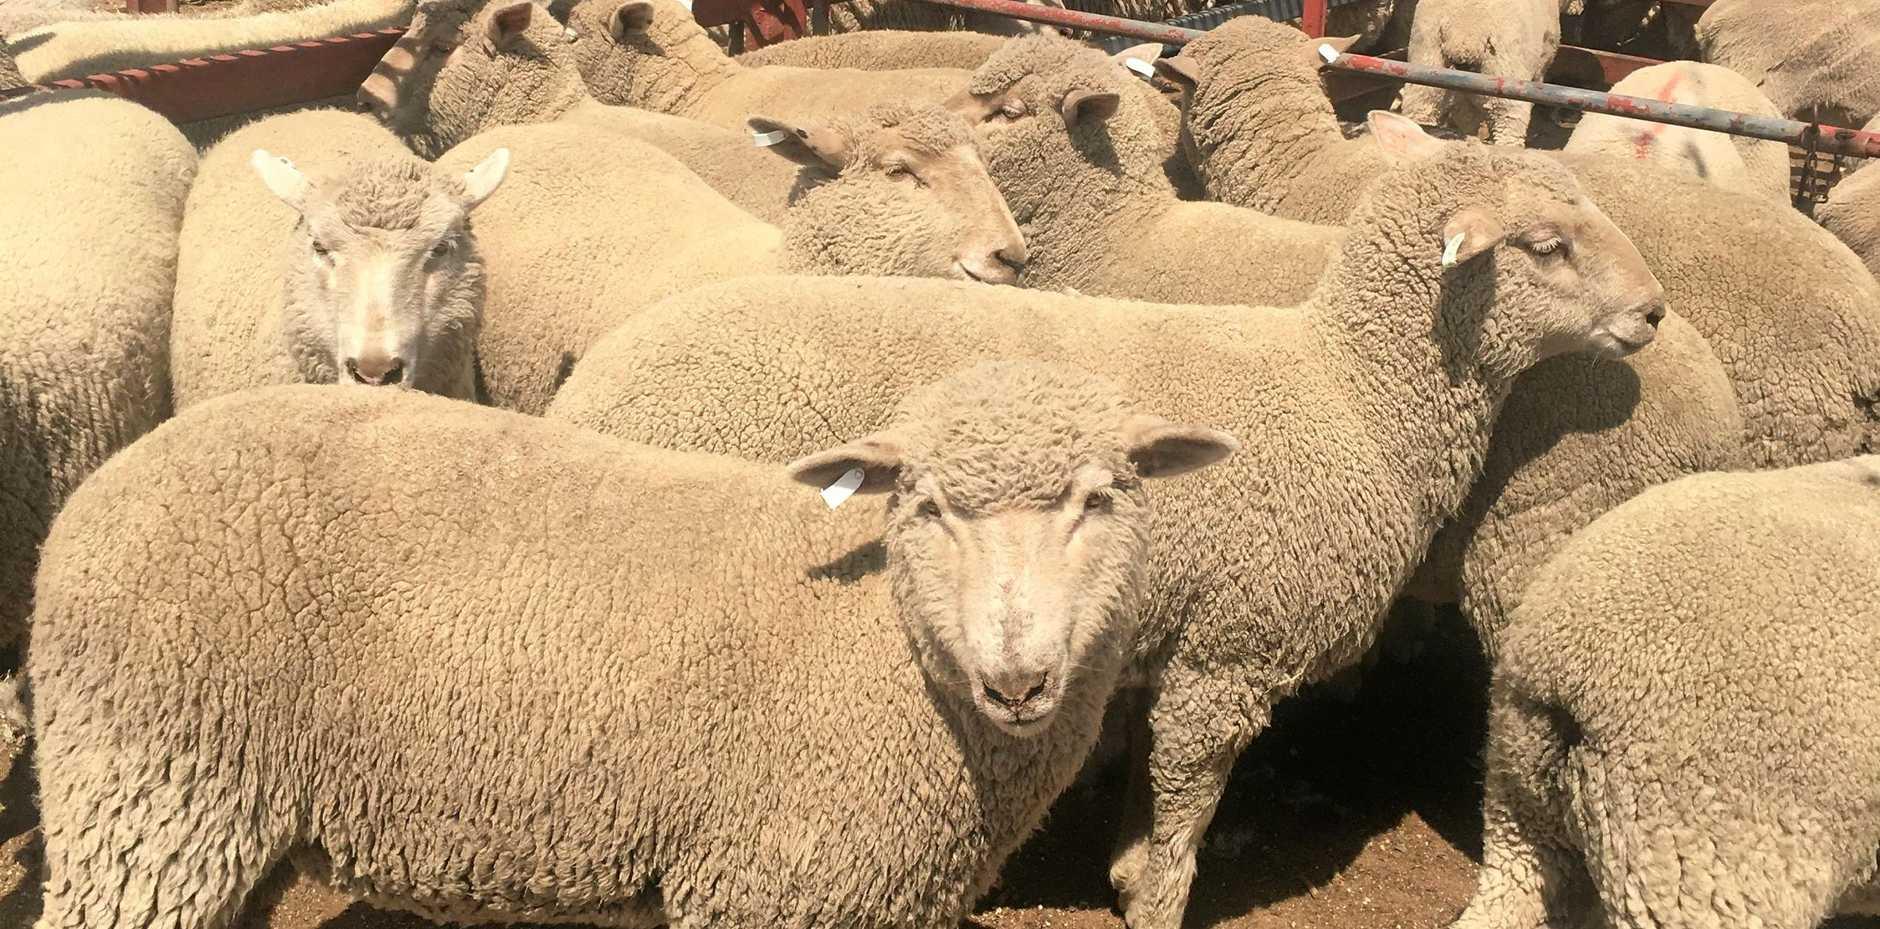 New threat to sheep | Warwick Daily News